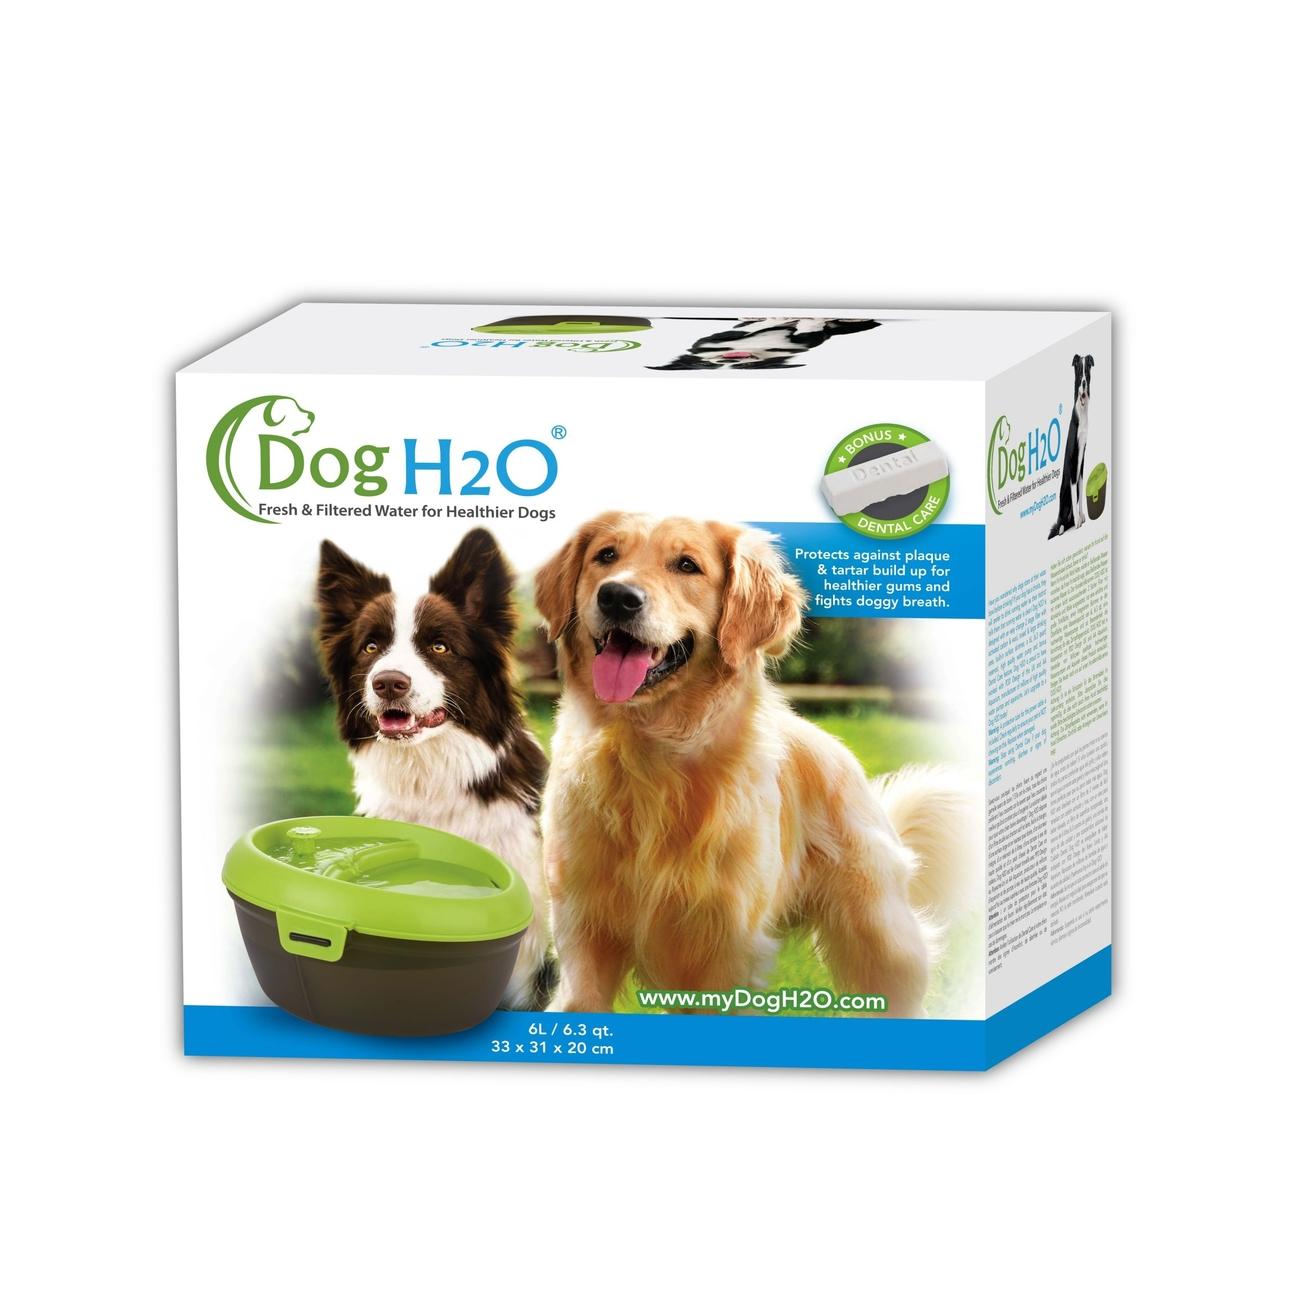 Dog H2O MyDog H2O Hundetrinkbrunnen, Bild 2